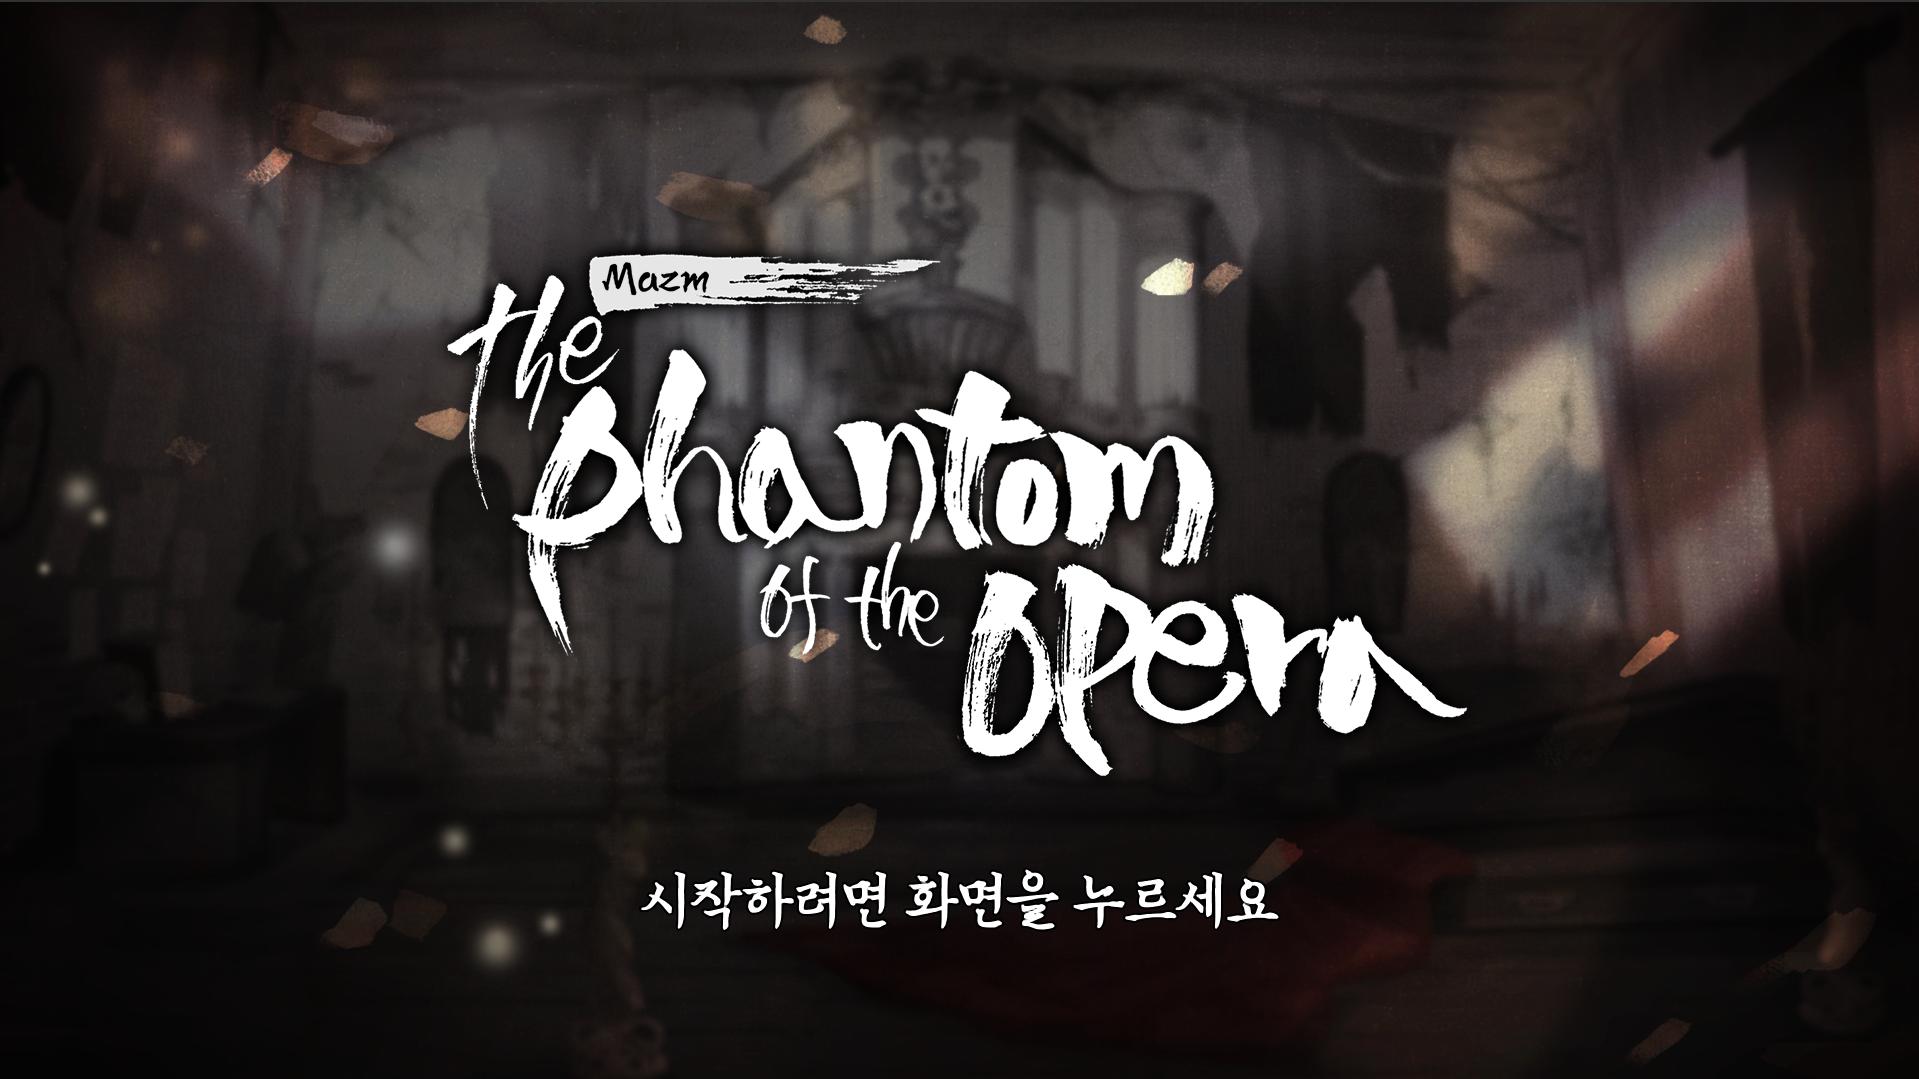 [MWU Korea '18] MazM: 오페라의 유령 / 자라나는씨앗